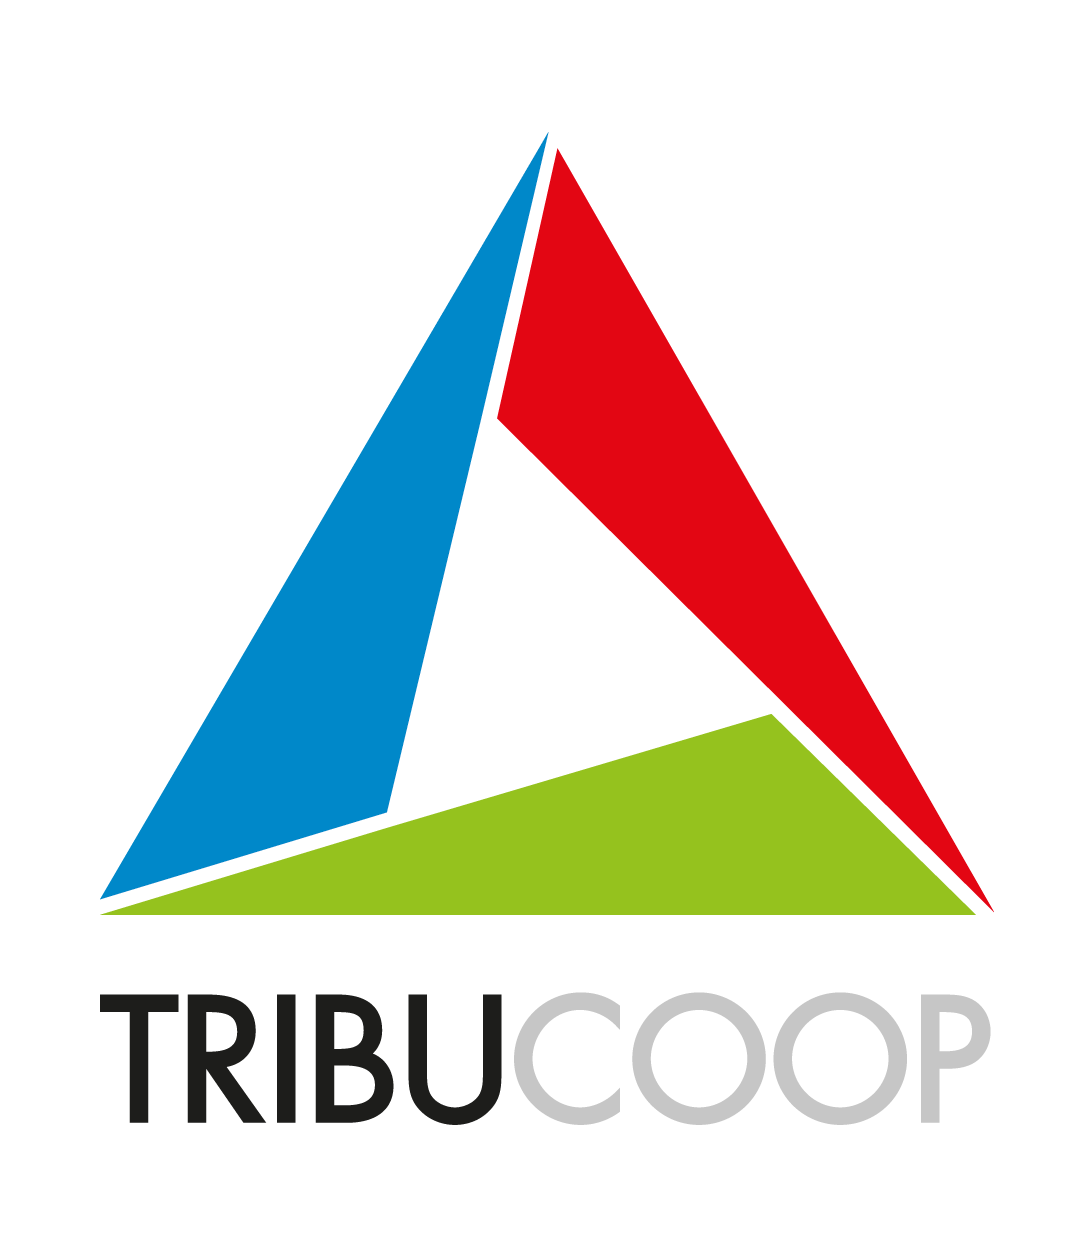 Tribucoop Logo